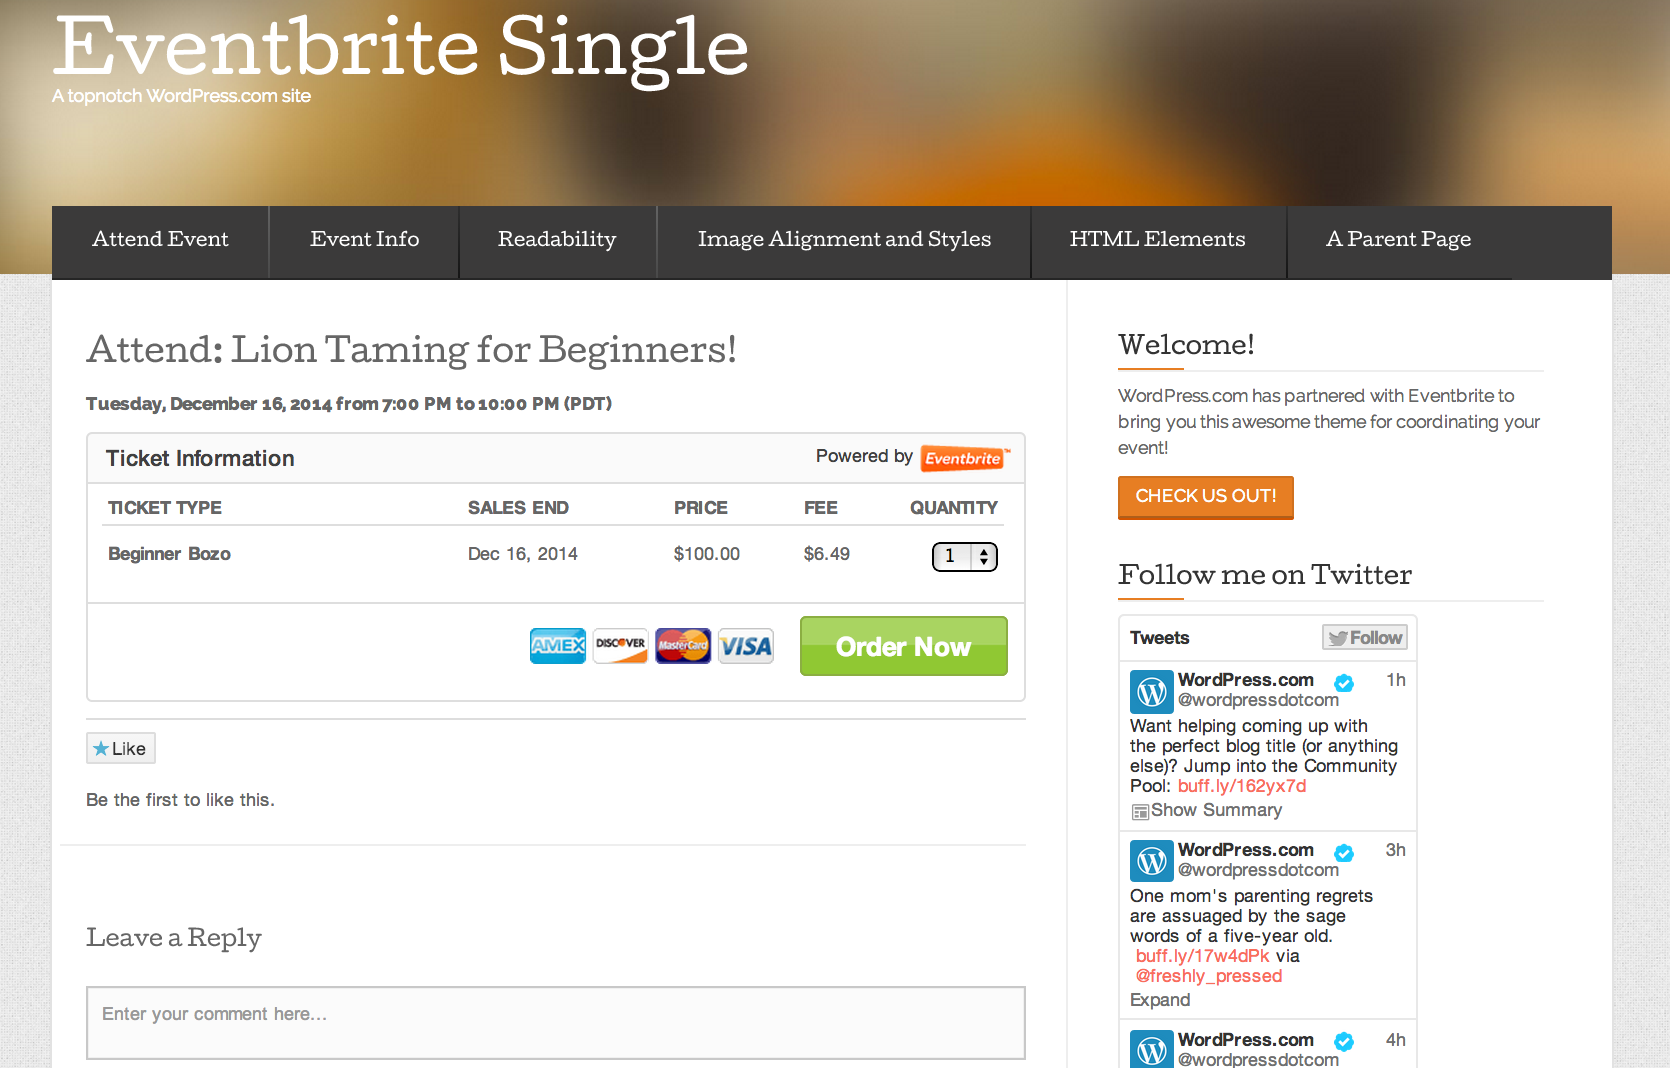 Eventbrite Single Event Theme — WordPress.com